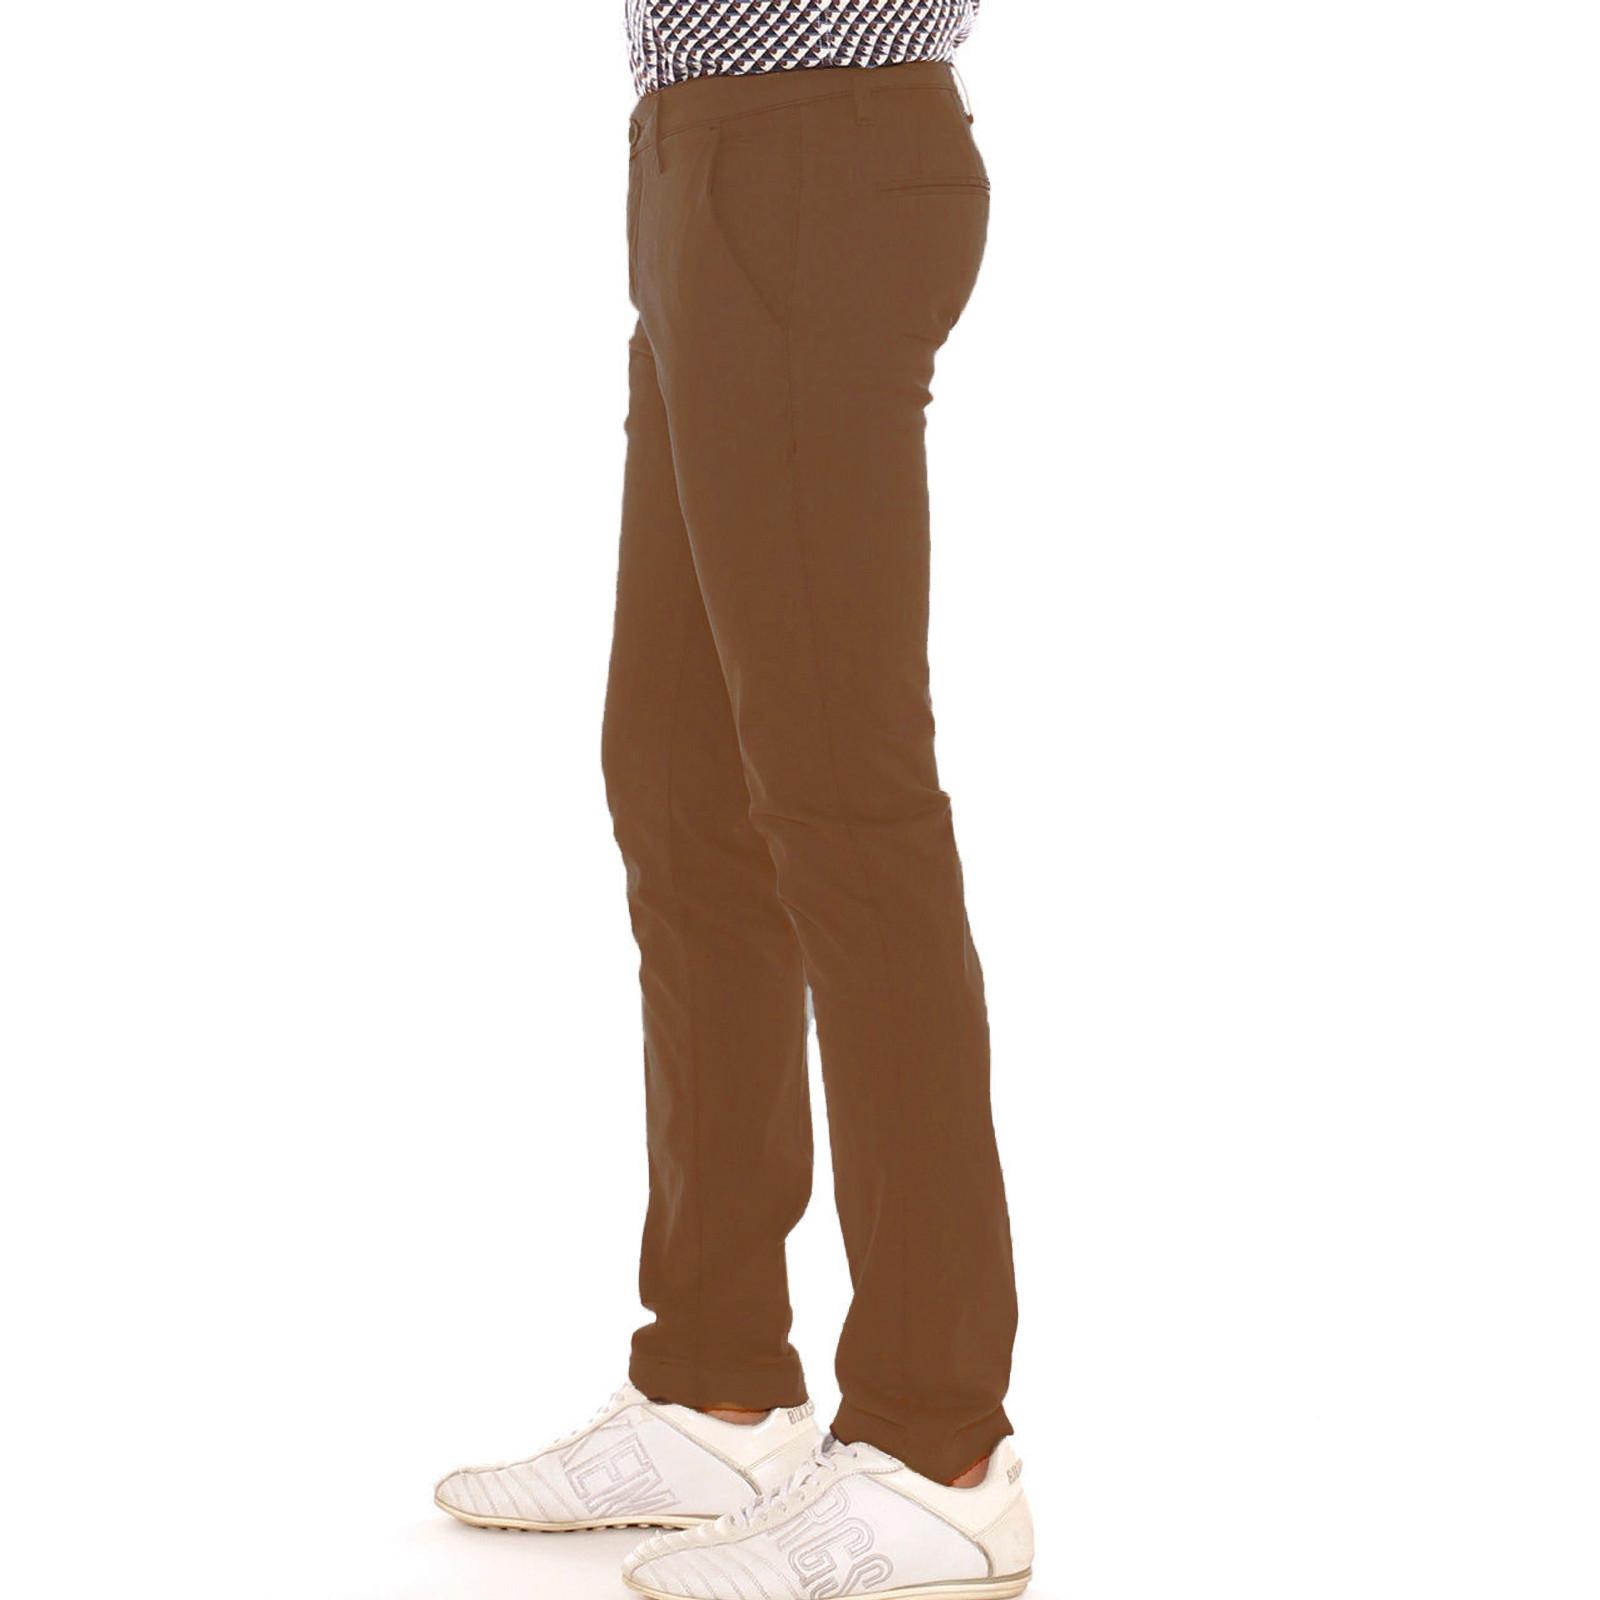 Pantalone-Uomo-Slim-fit-Chino-Elegante-Invernale-America-Cotone-Tasca-america miniatura 32